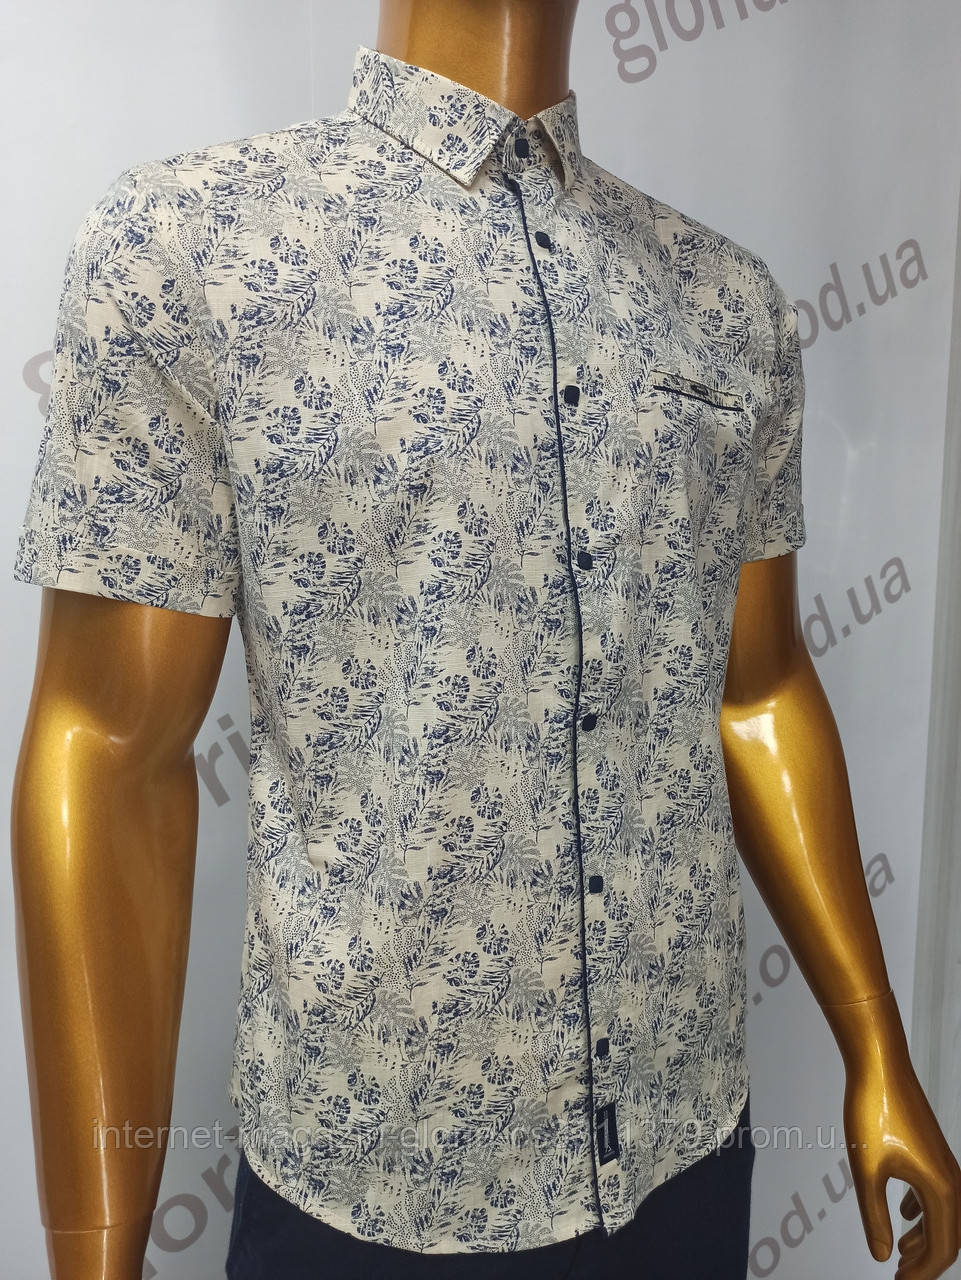 Мужская рубашка Amato. AG.19885(j). Размеры:M,L,XL, 2XL.